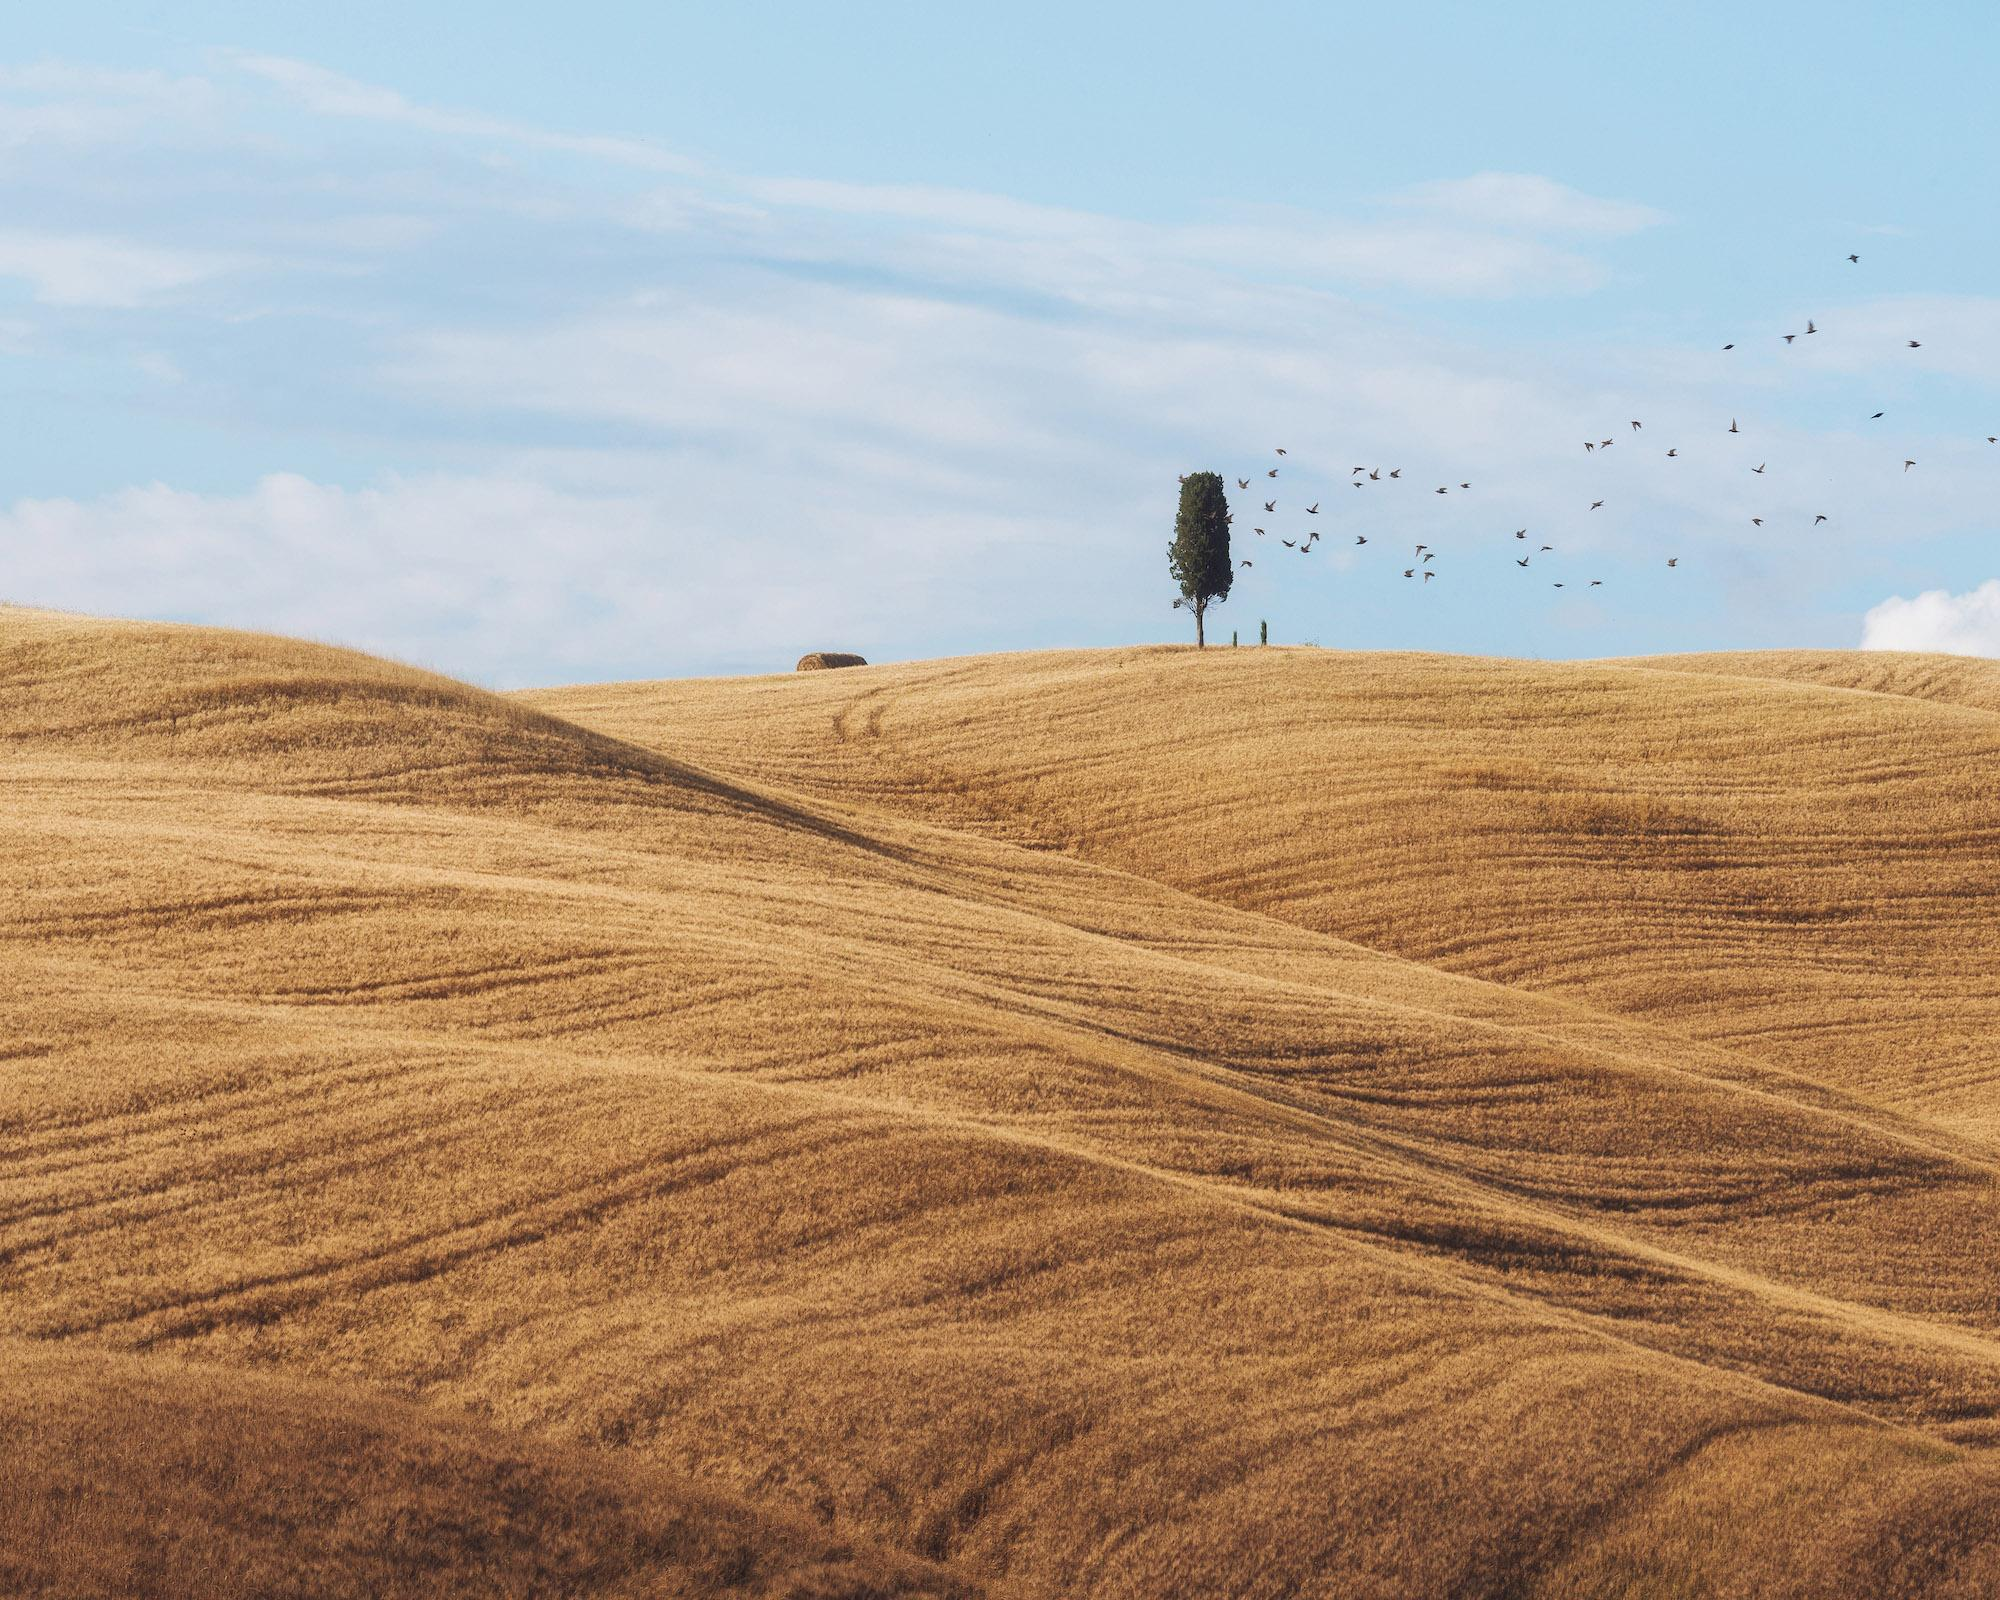 by Daniel Kordan - Summer Tuscany